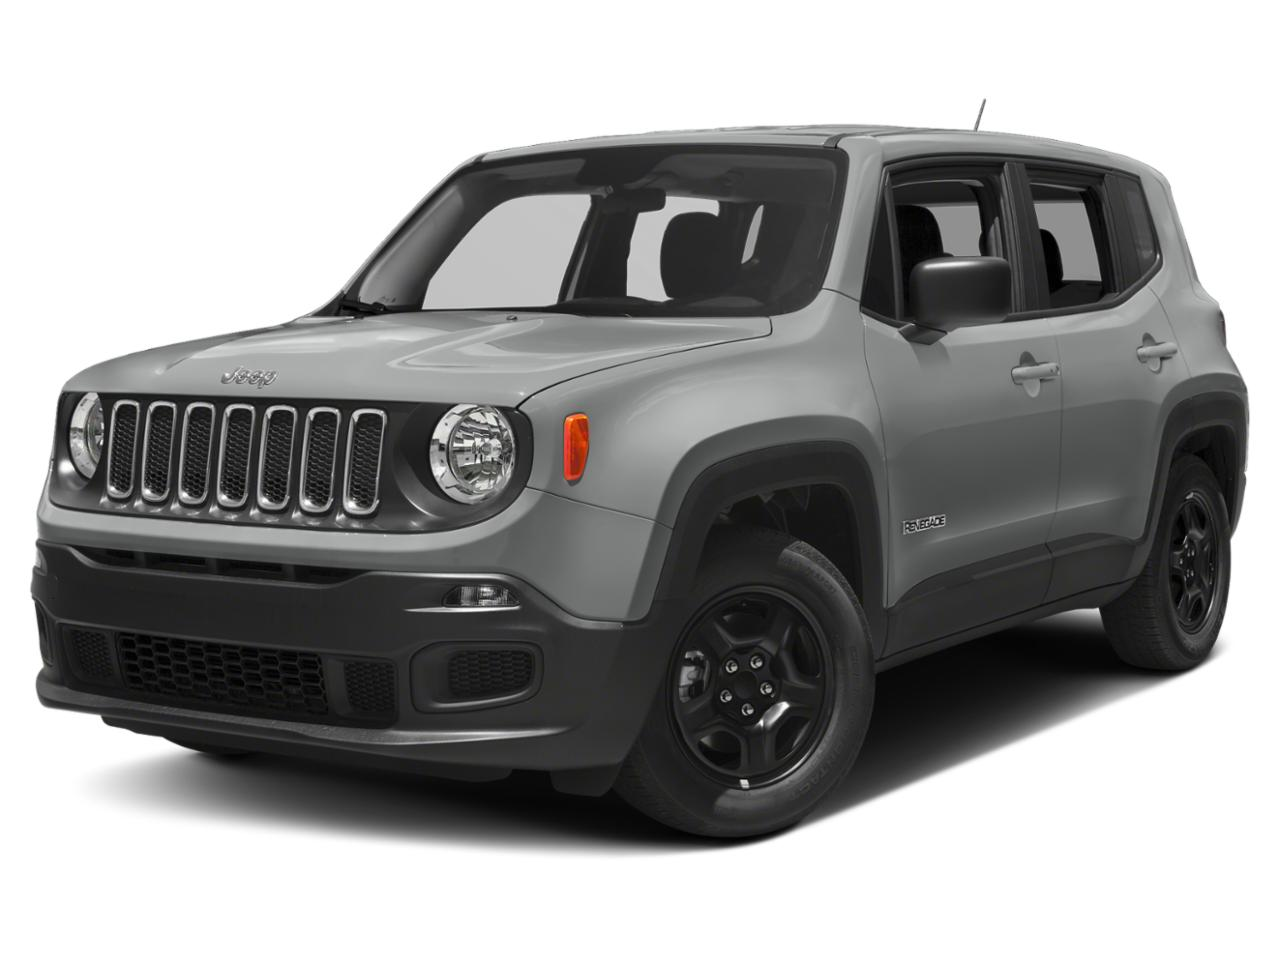 2018 Jeep Renegade Vehicle Photo in Medina, OH 44256